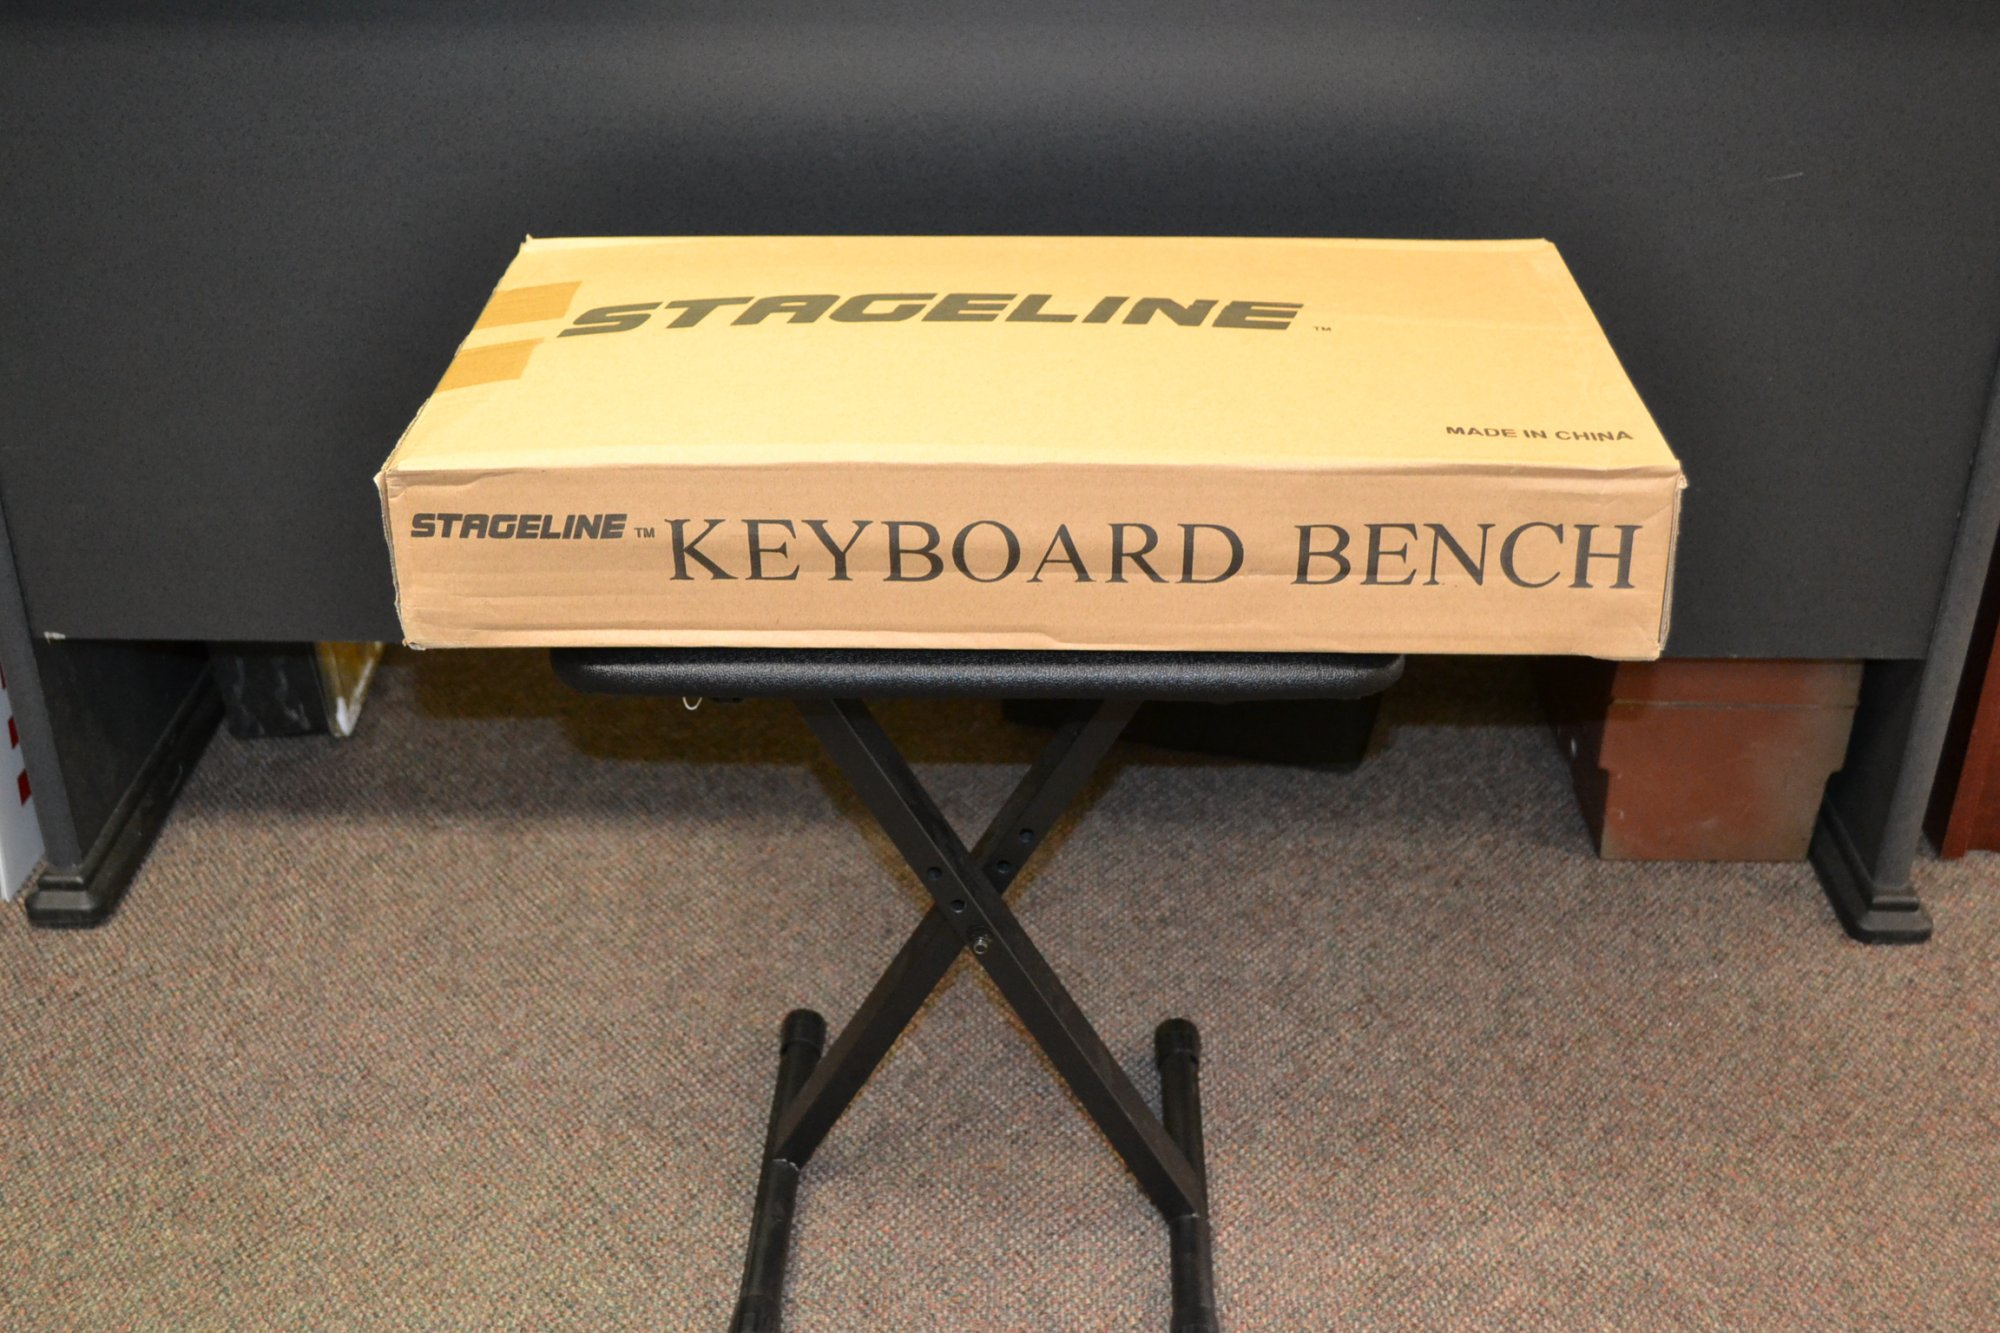 Keyboard Bench Seat Stageline